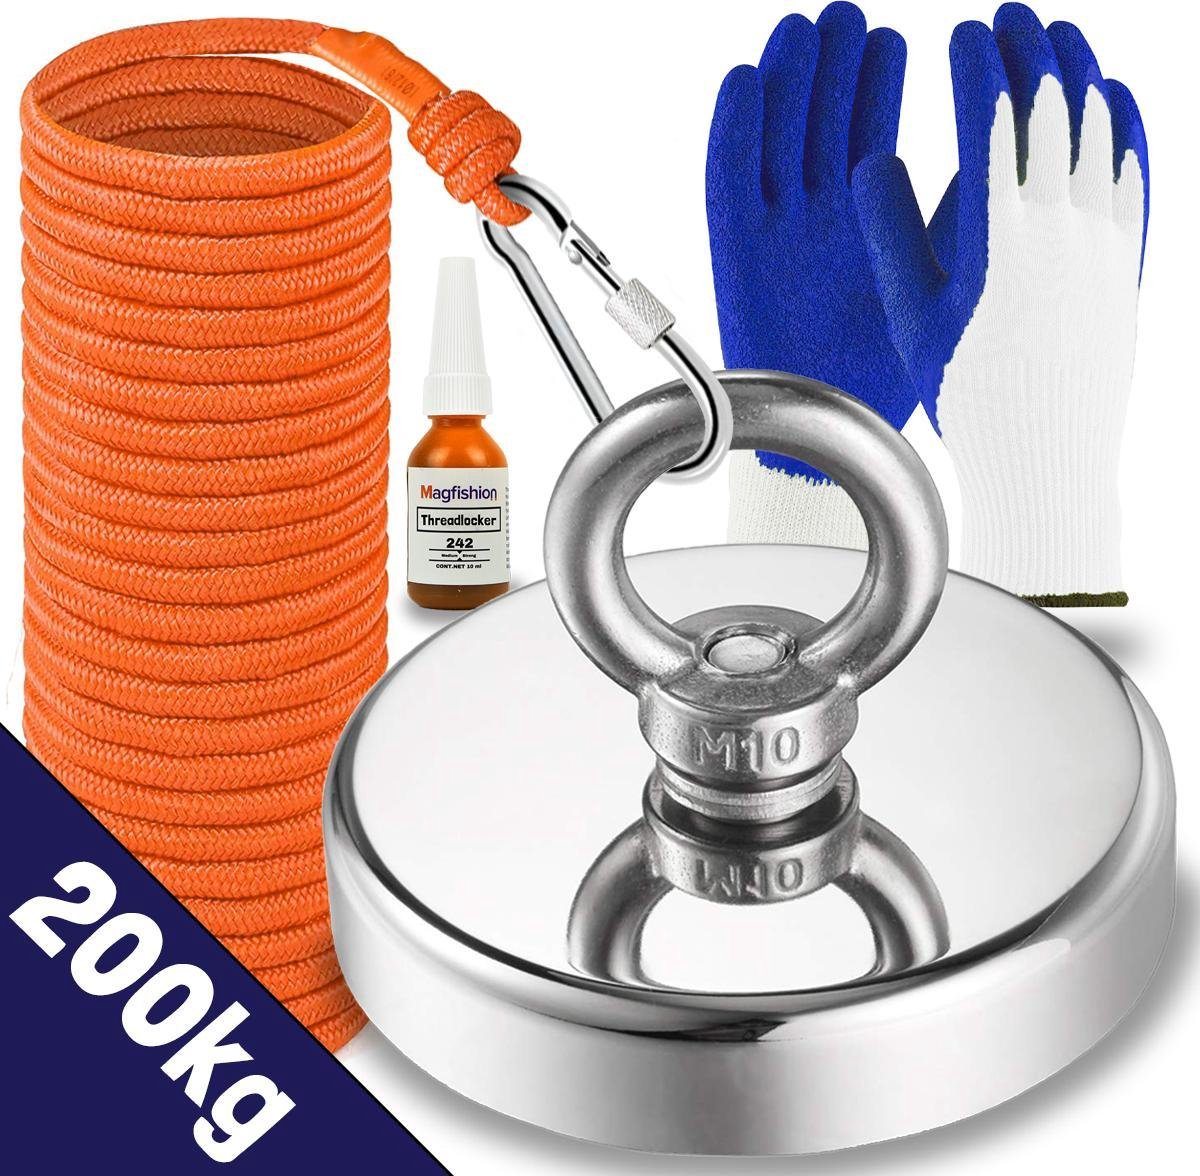 Magfishion® Vismagneet Set - 200 KG - Magneetvissen - 20m Touw + Karabijnhaak met Schroefsluiting -